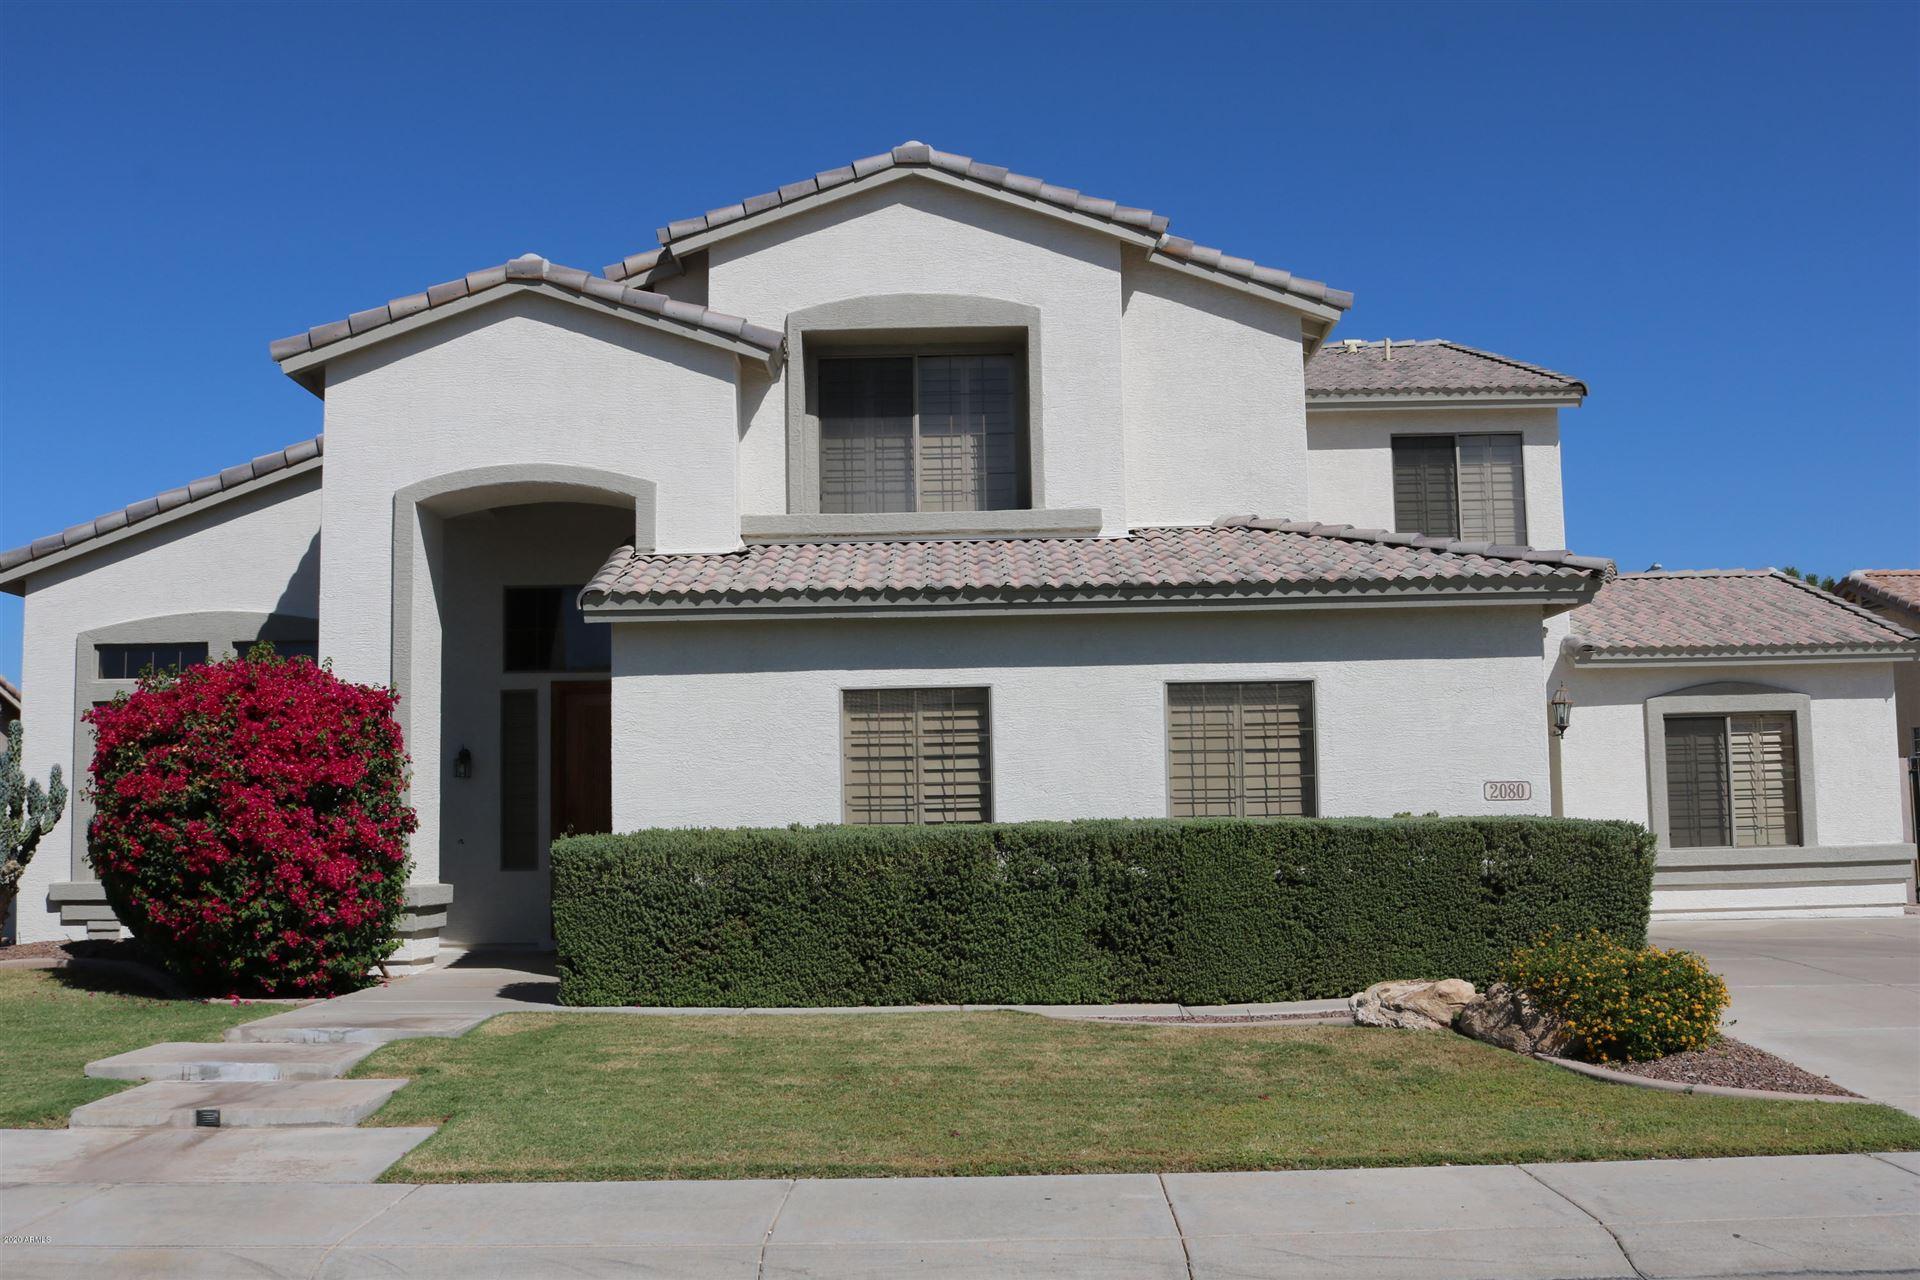 2080 W MULBERRY Drive, Chandler, AZ 85286 - #: 6100621